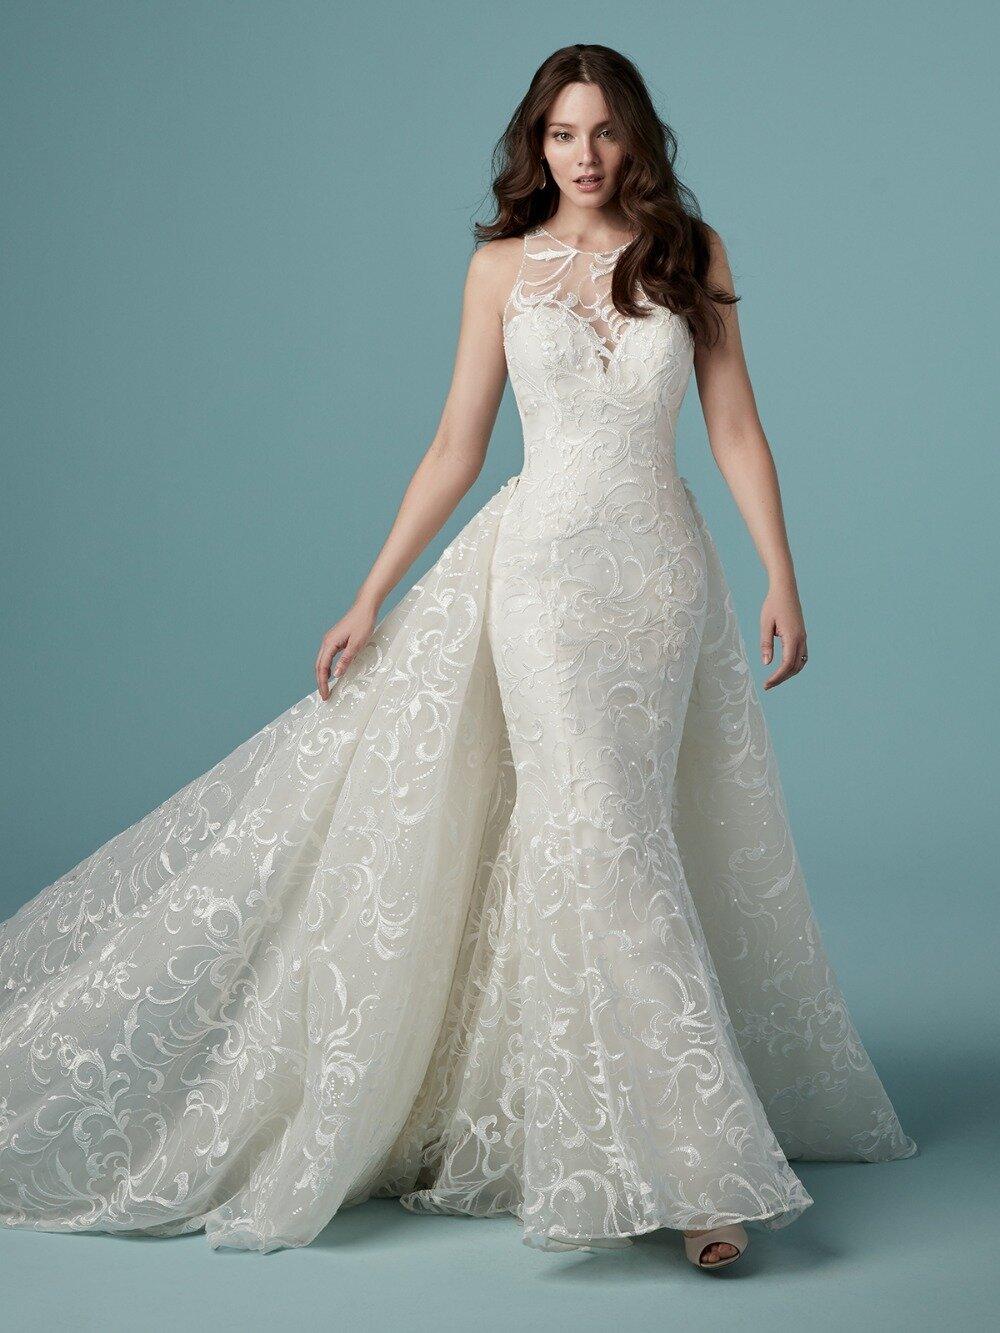 830632_wedding-dress-trends-we-love-for-2020-br.jpg